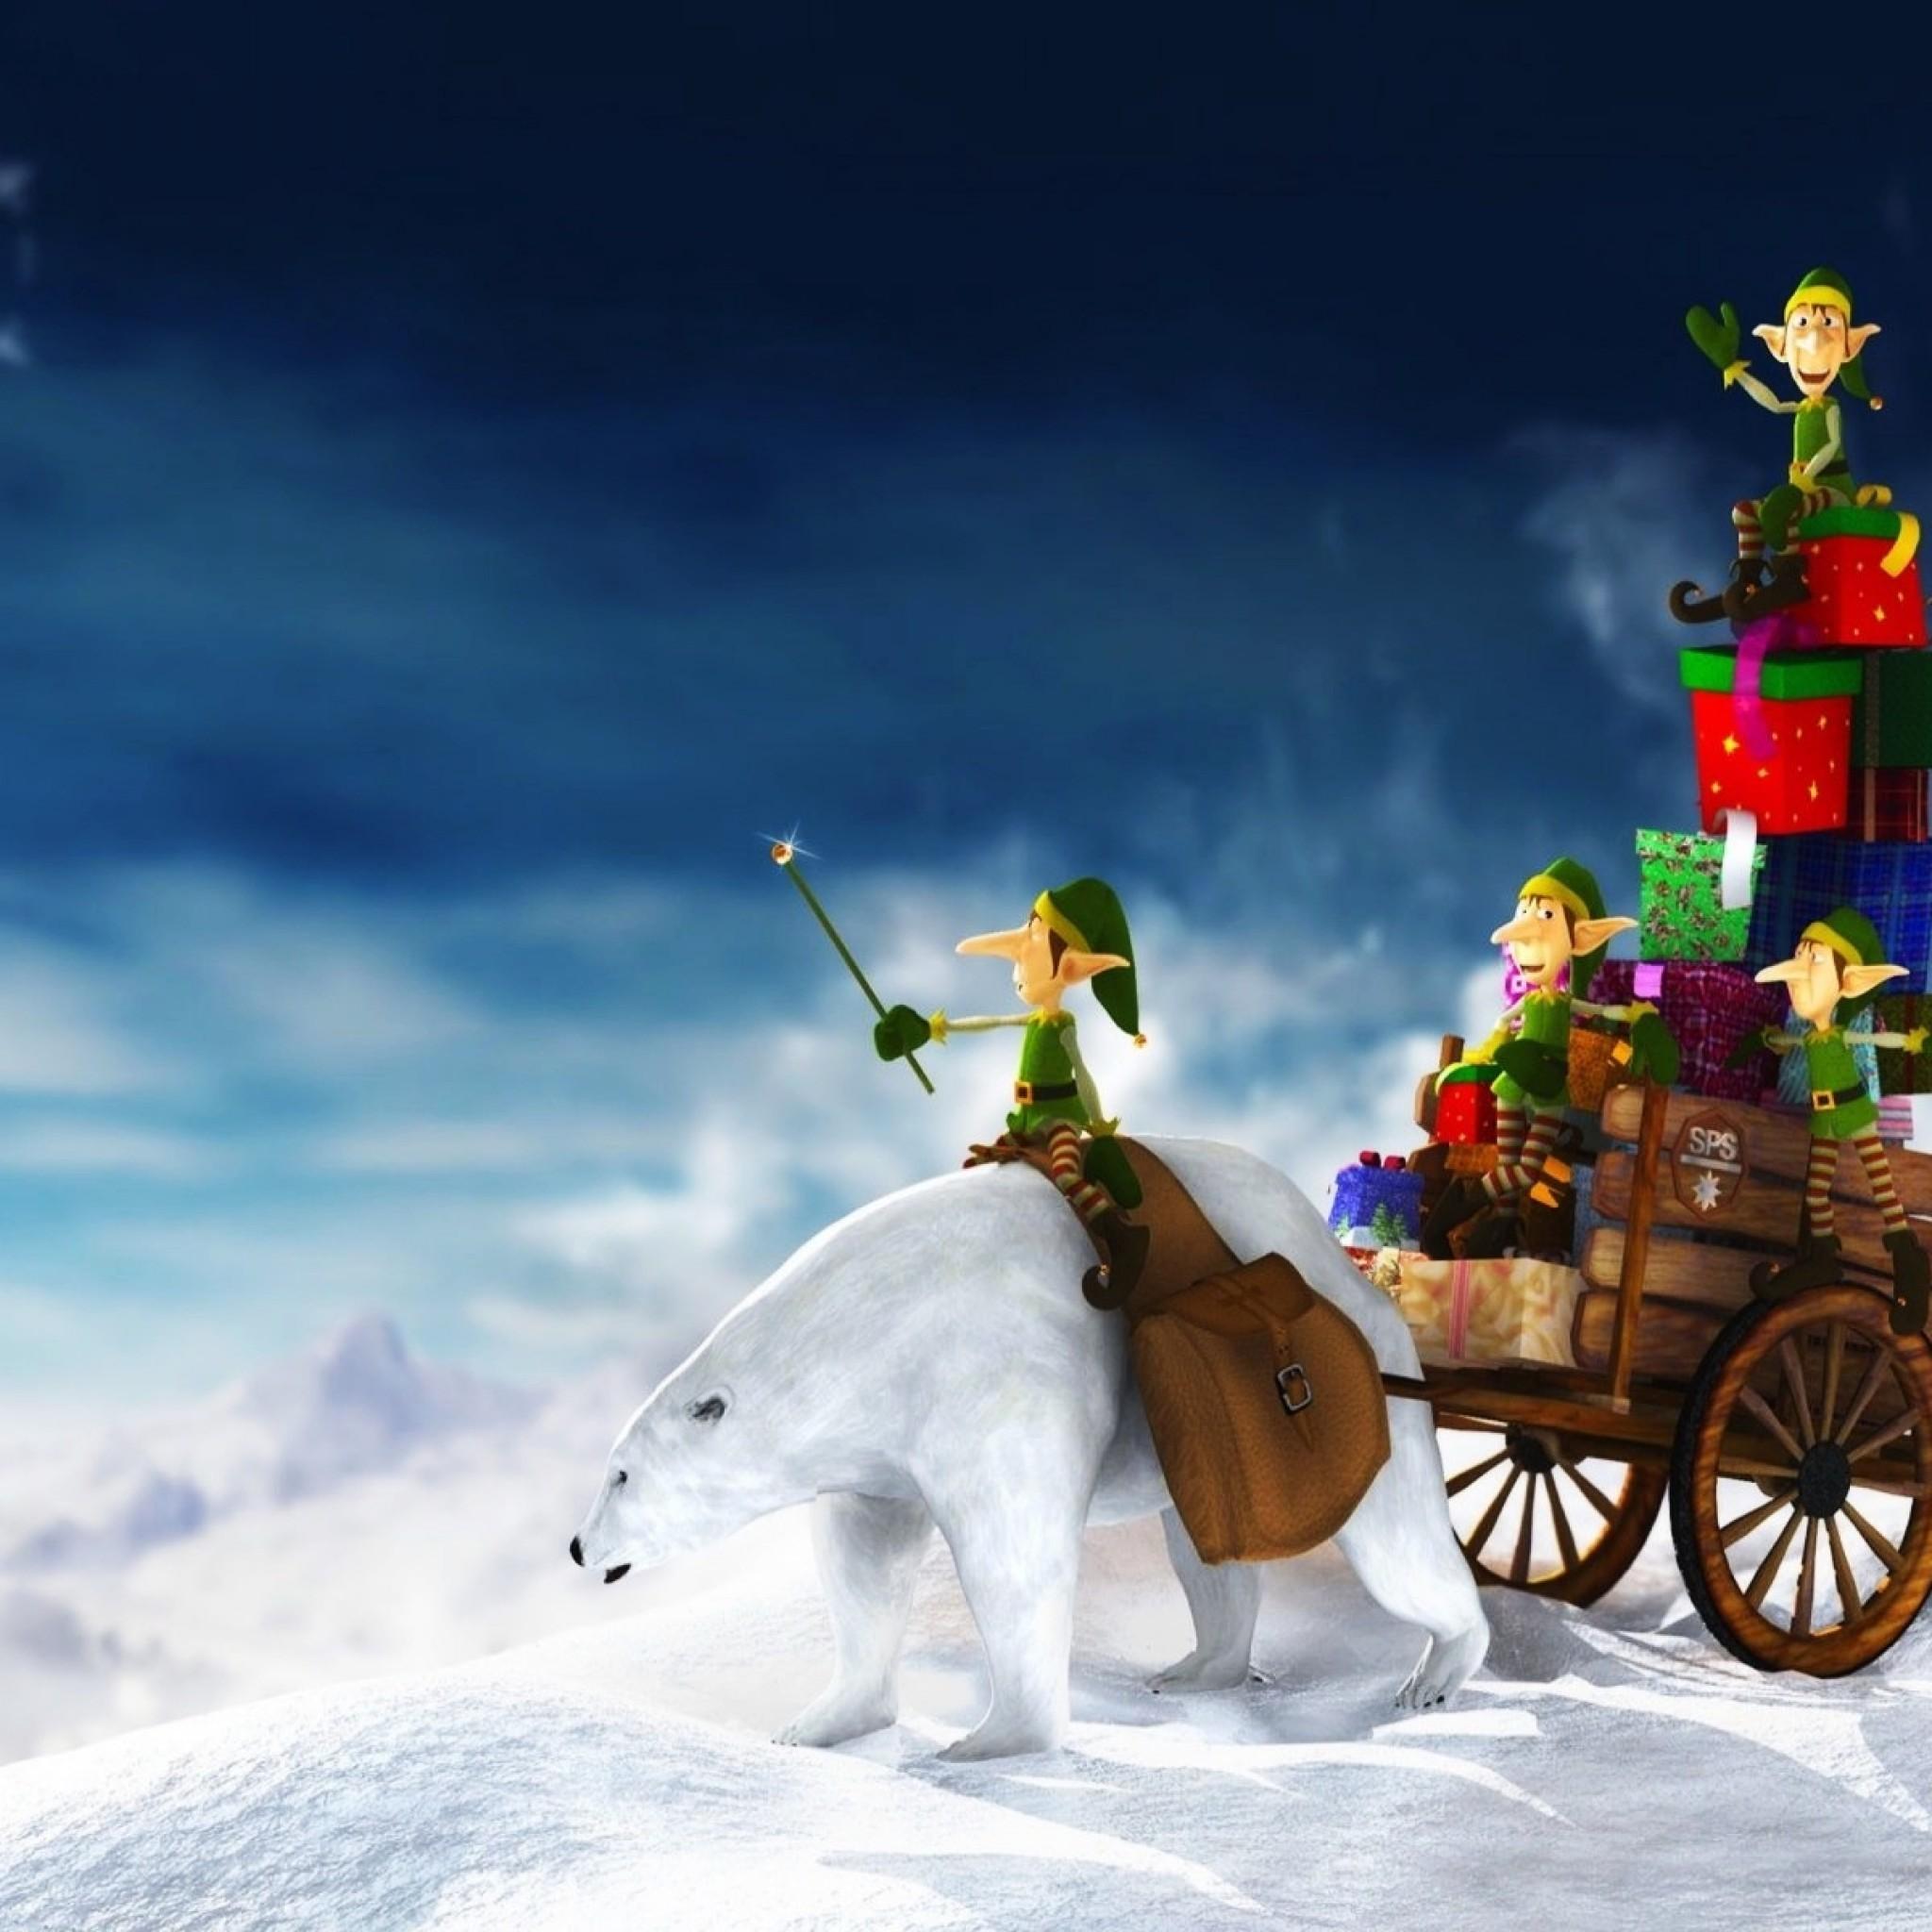 3D Christmas Wallpaper For Ipad